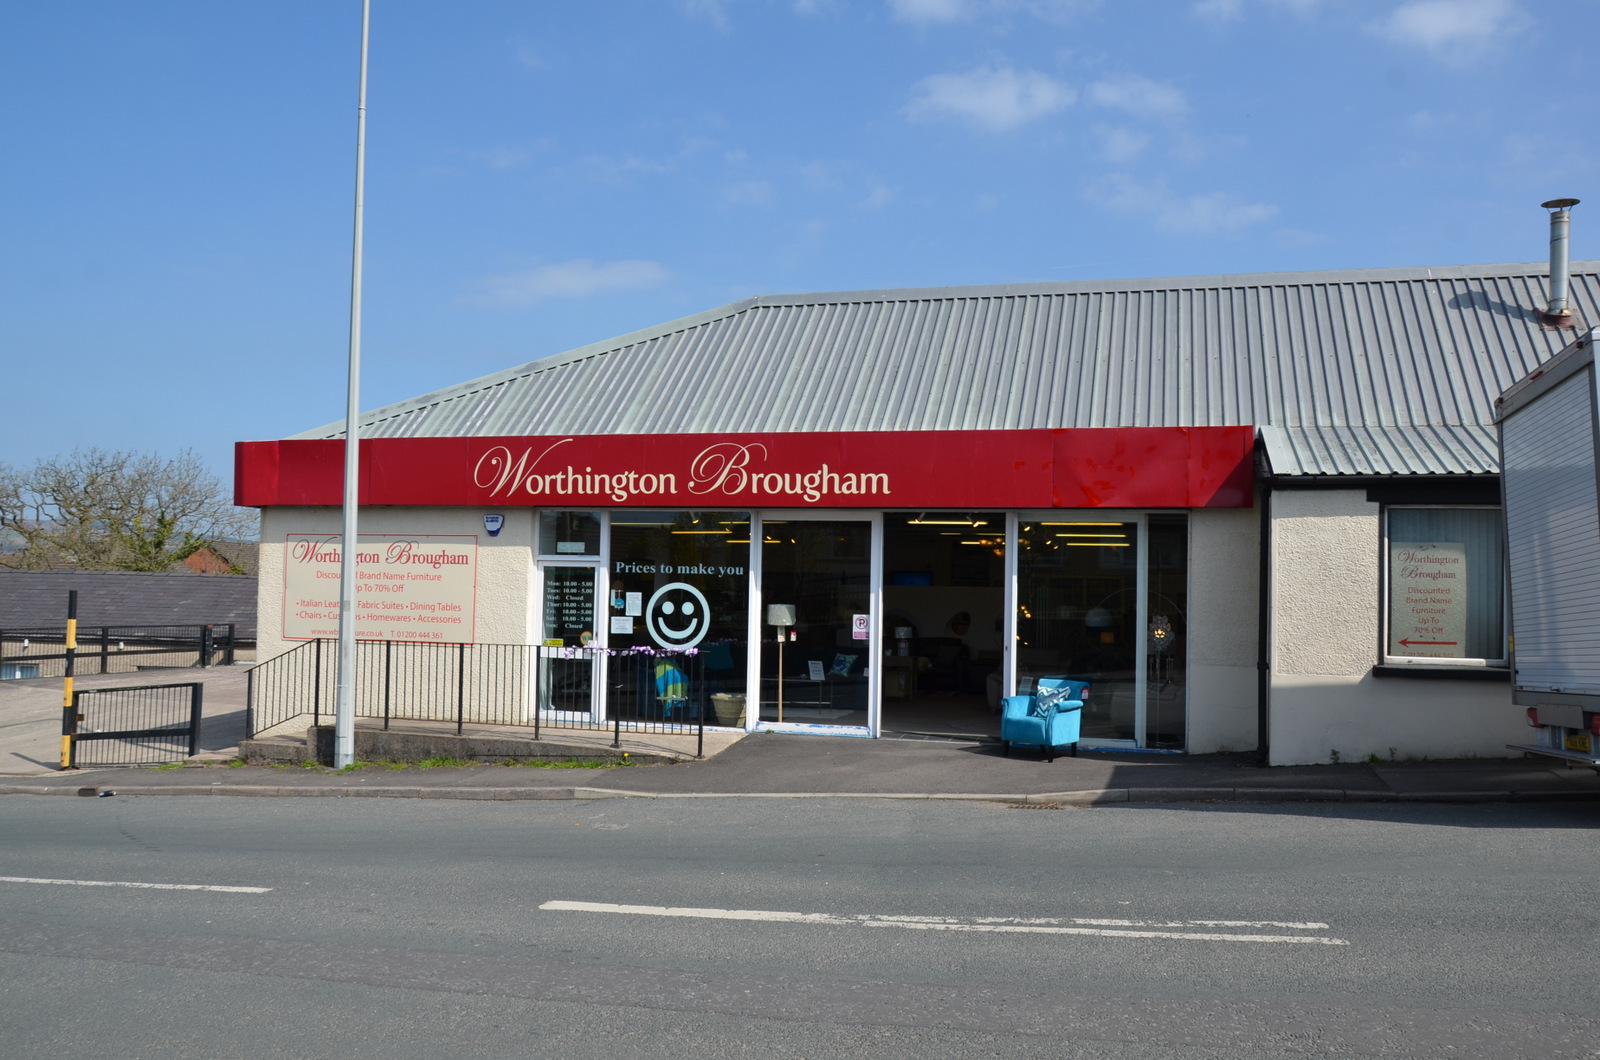 Worthington Brougham Furniture Discount Designer Sofas in Clitheroe Lancashire